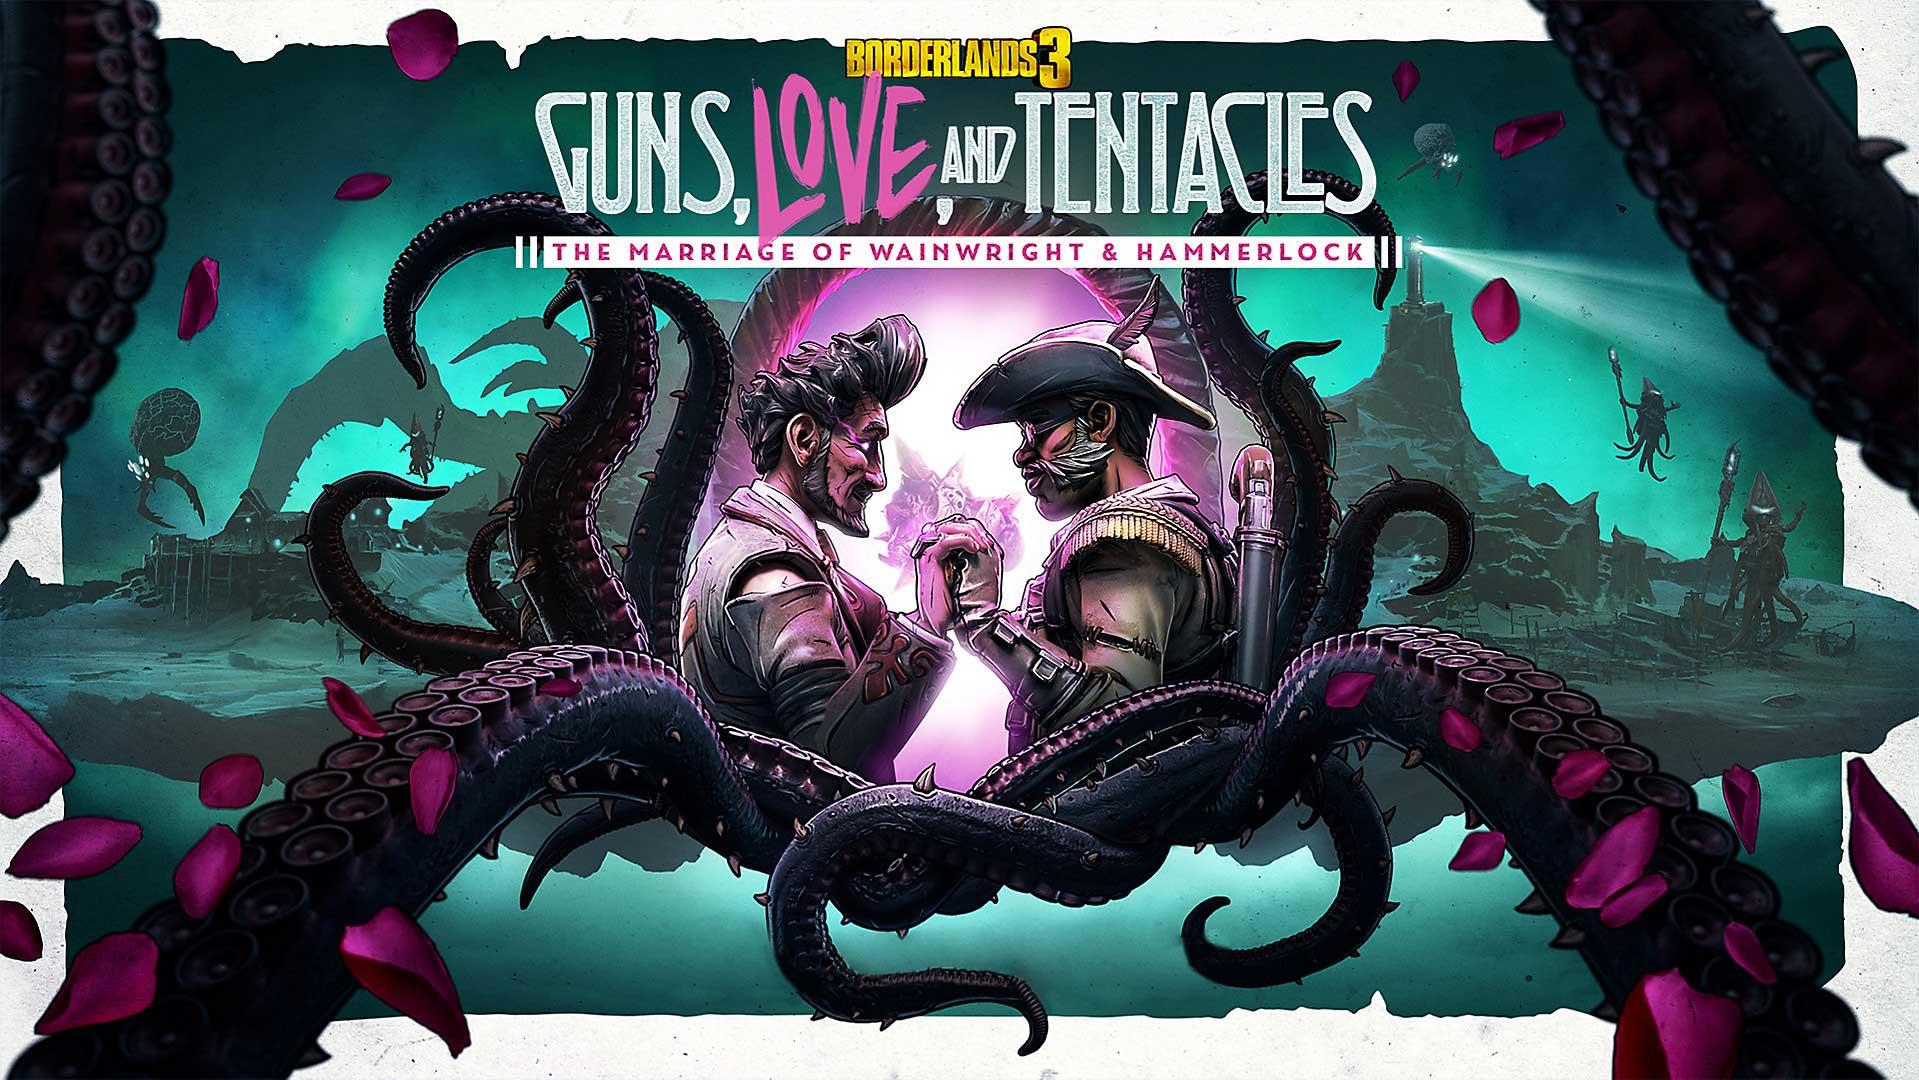 Borderlands 3 – Guns, Love, and Tentacles: The Marriage of Wainwright & Hammerlock